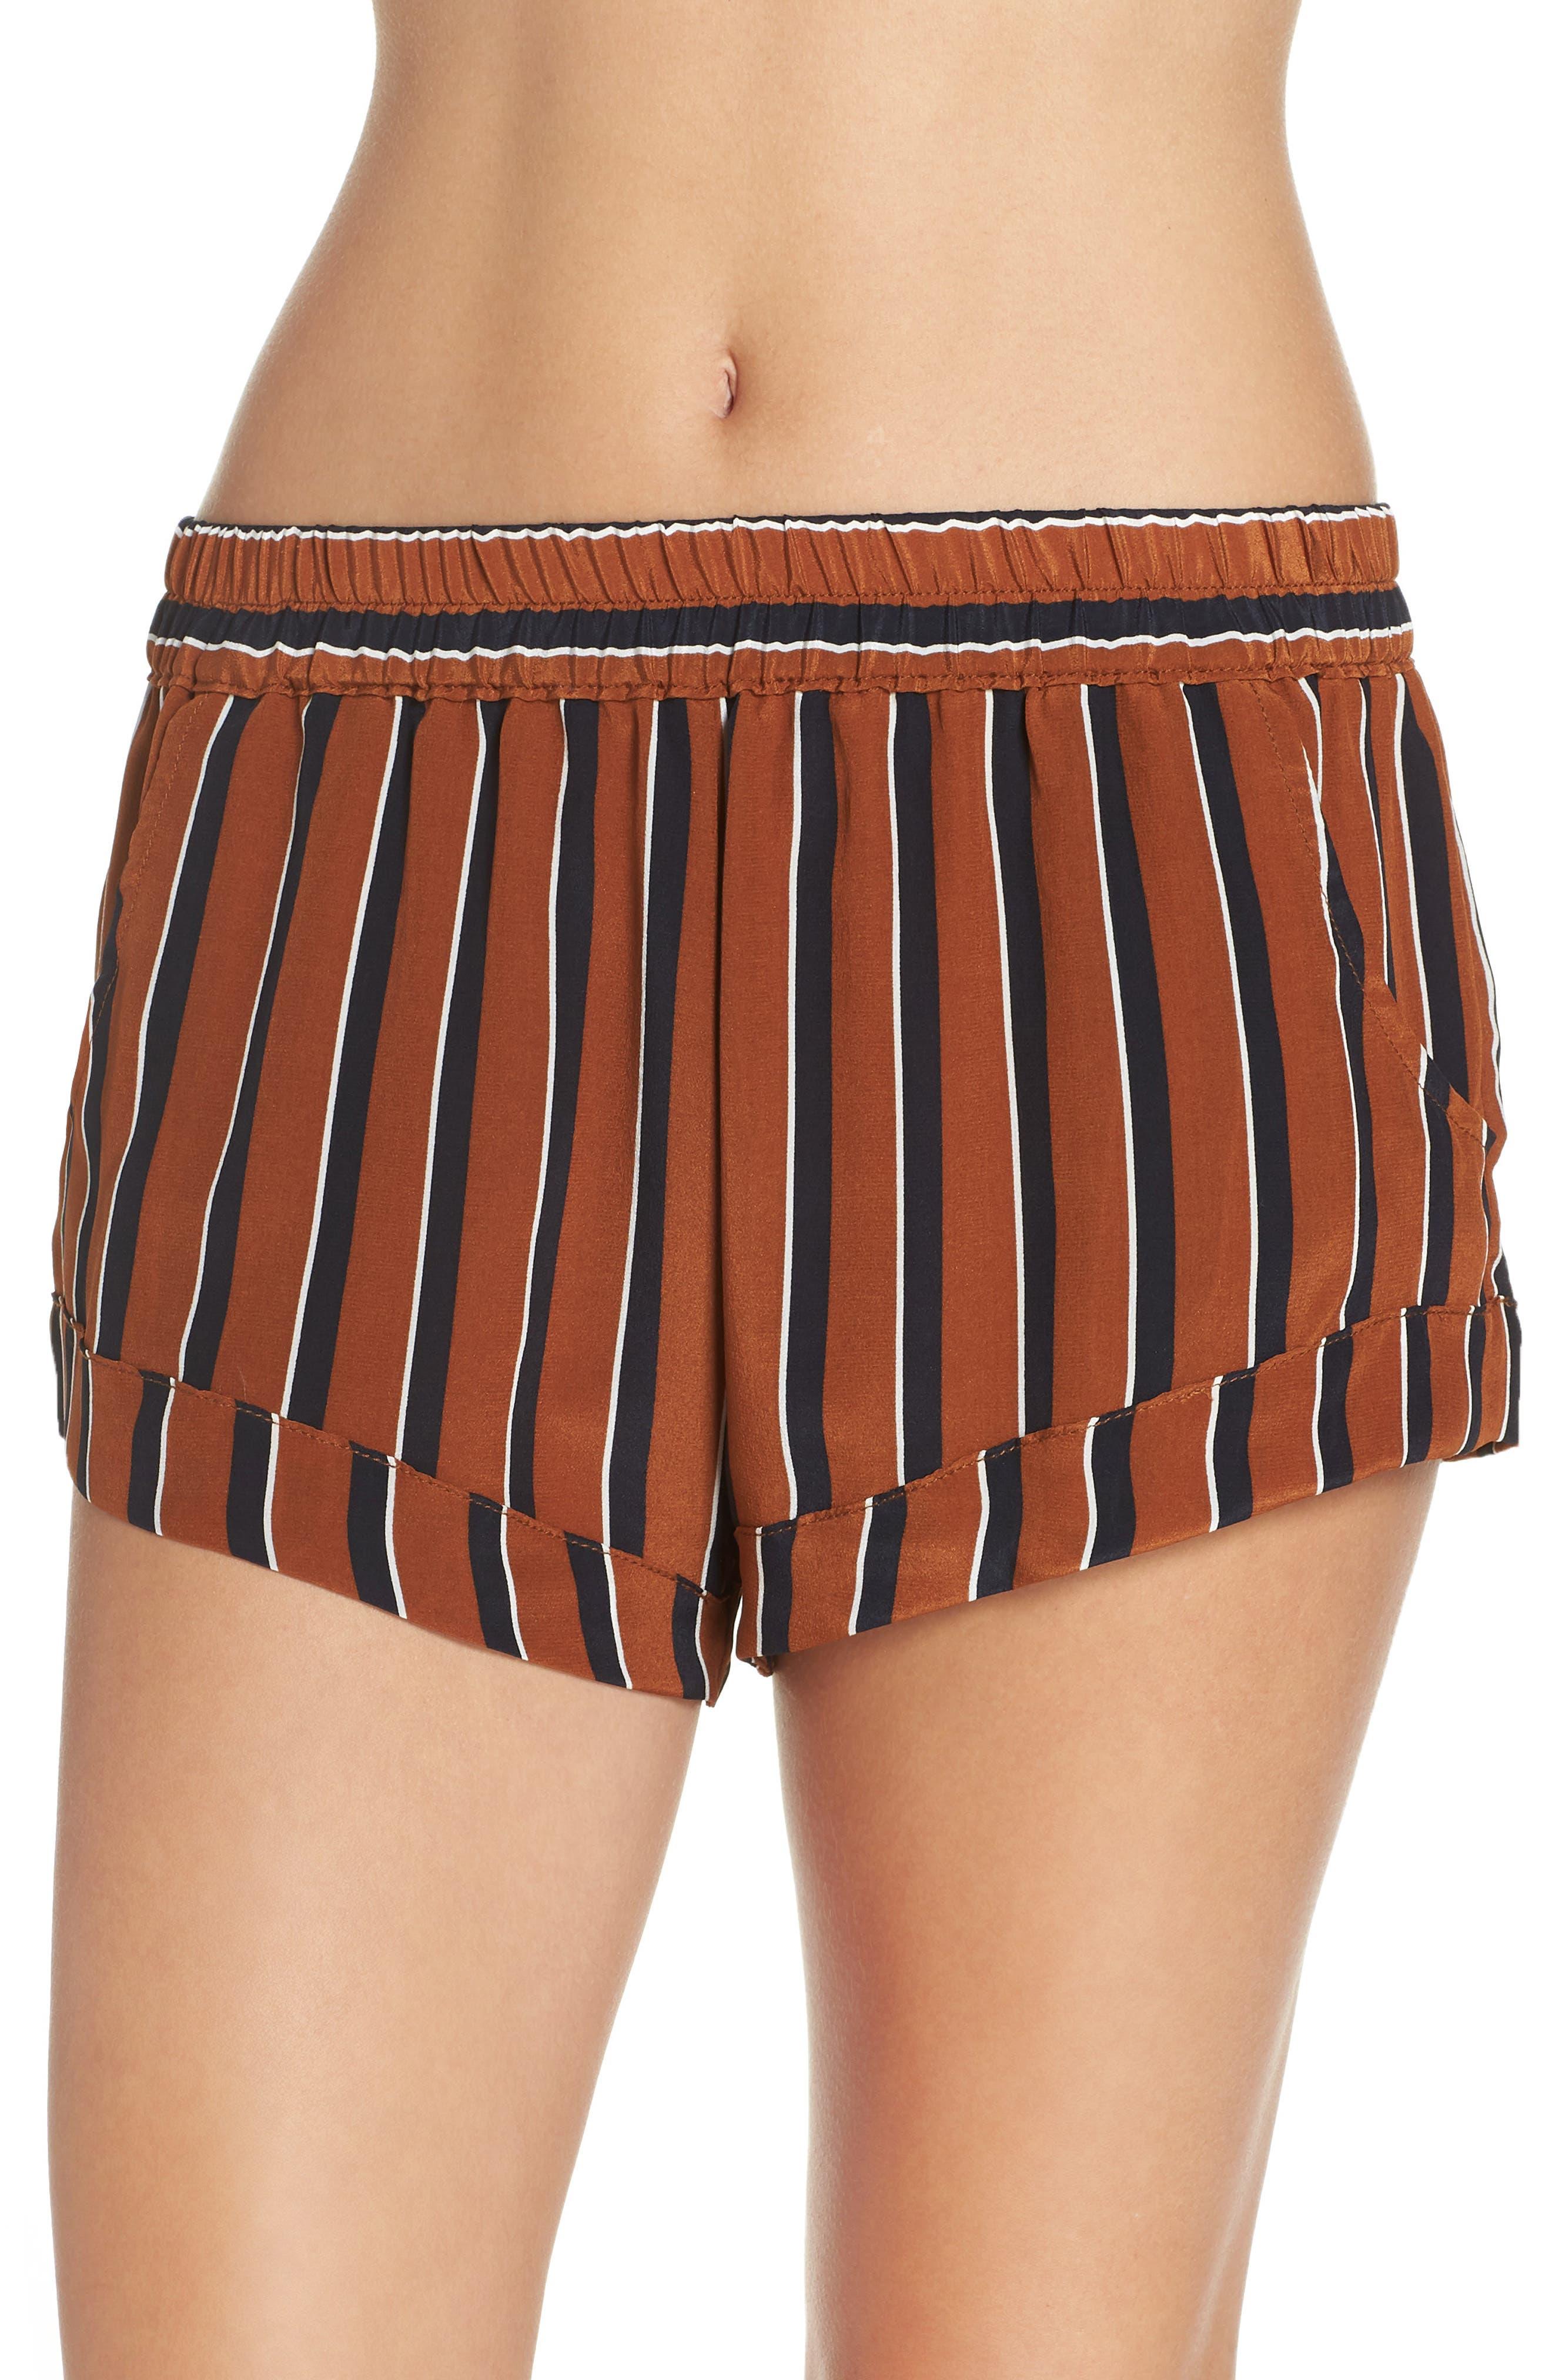 MAISON DU SOIR Mia Striped Silk Pajama Shorts in Tobacco Stripe